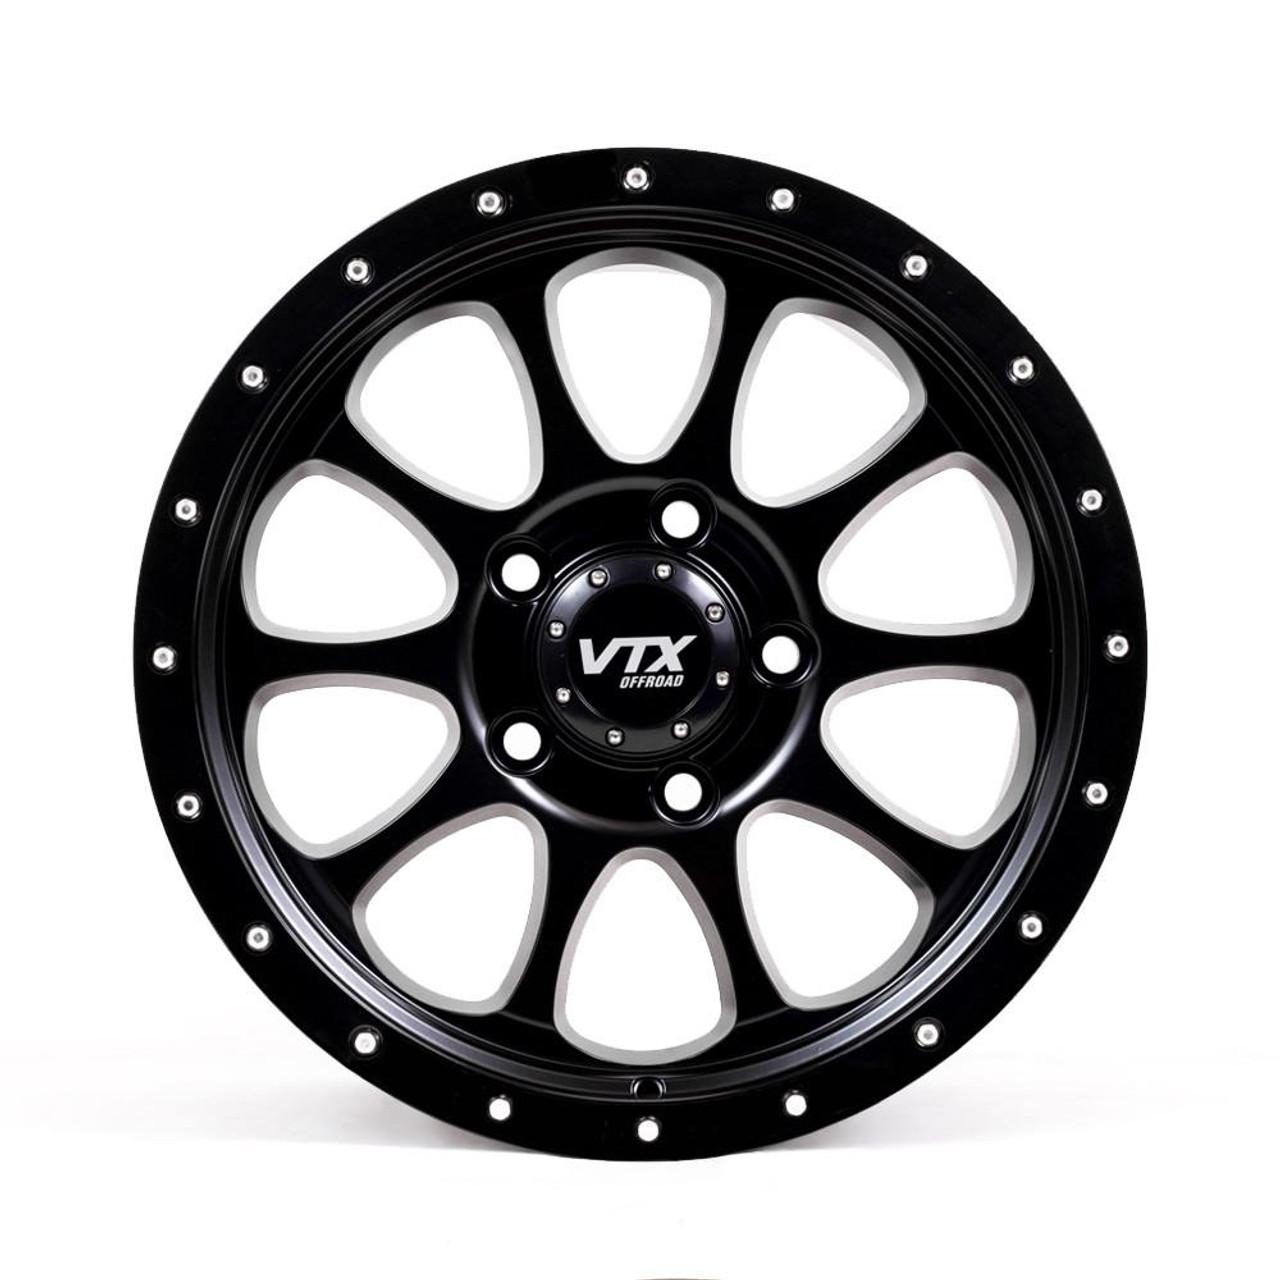 VTX Rogue - Satin Black 18x 9 in.